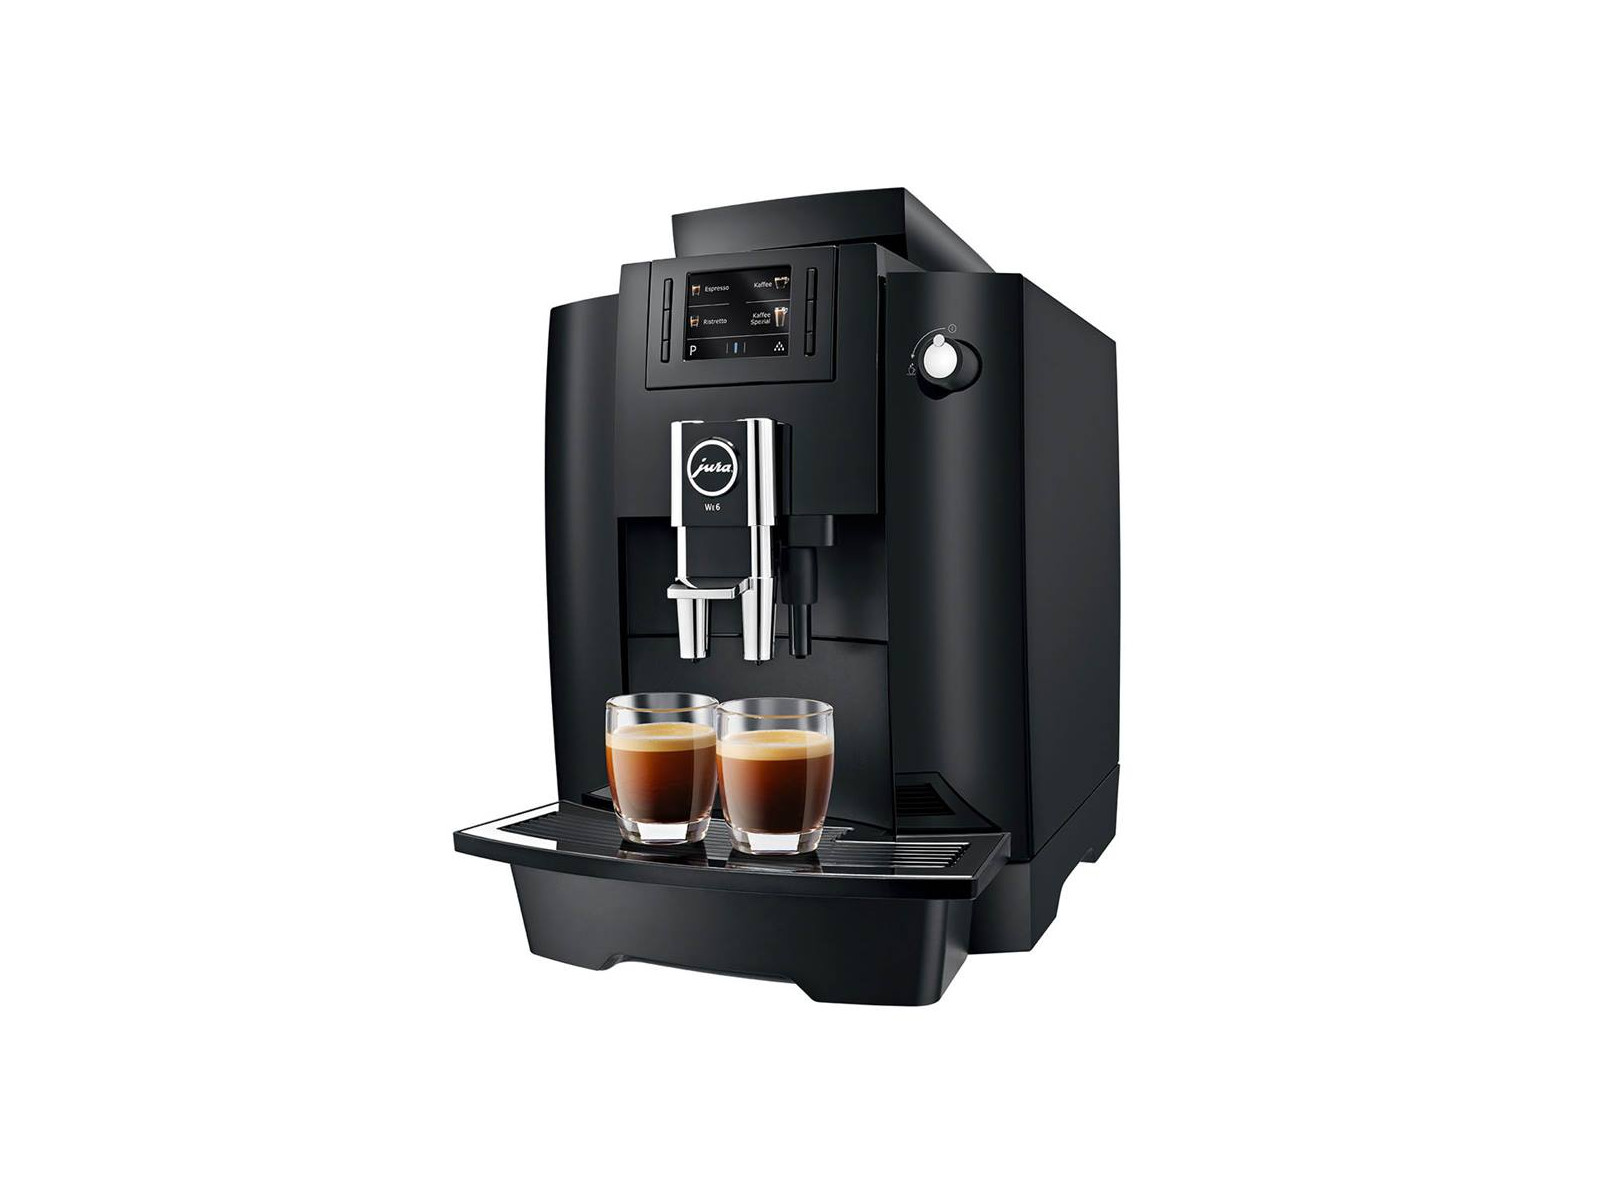 jura we6 kaffeevollautomat kaffee online kaufen kaffee handelsvertretung wiencek. Black Bedroom Furniture Sets. Home Design Ideas